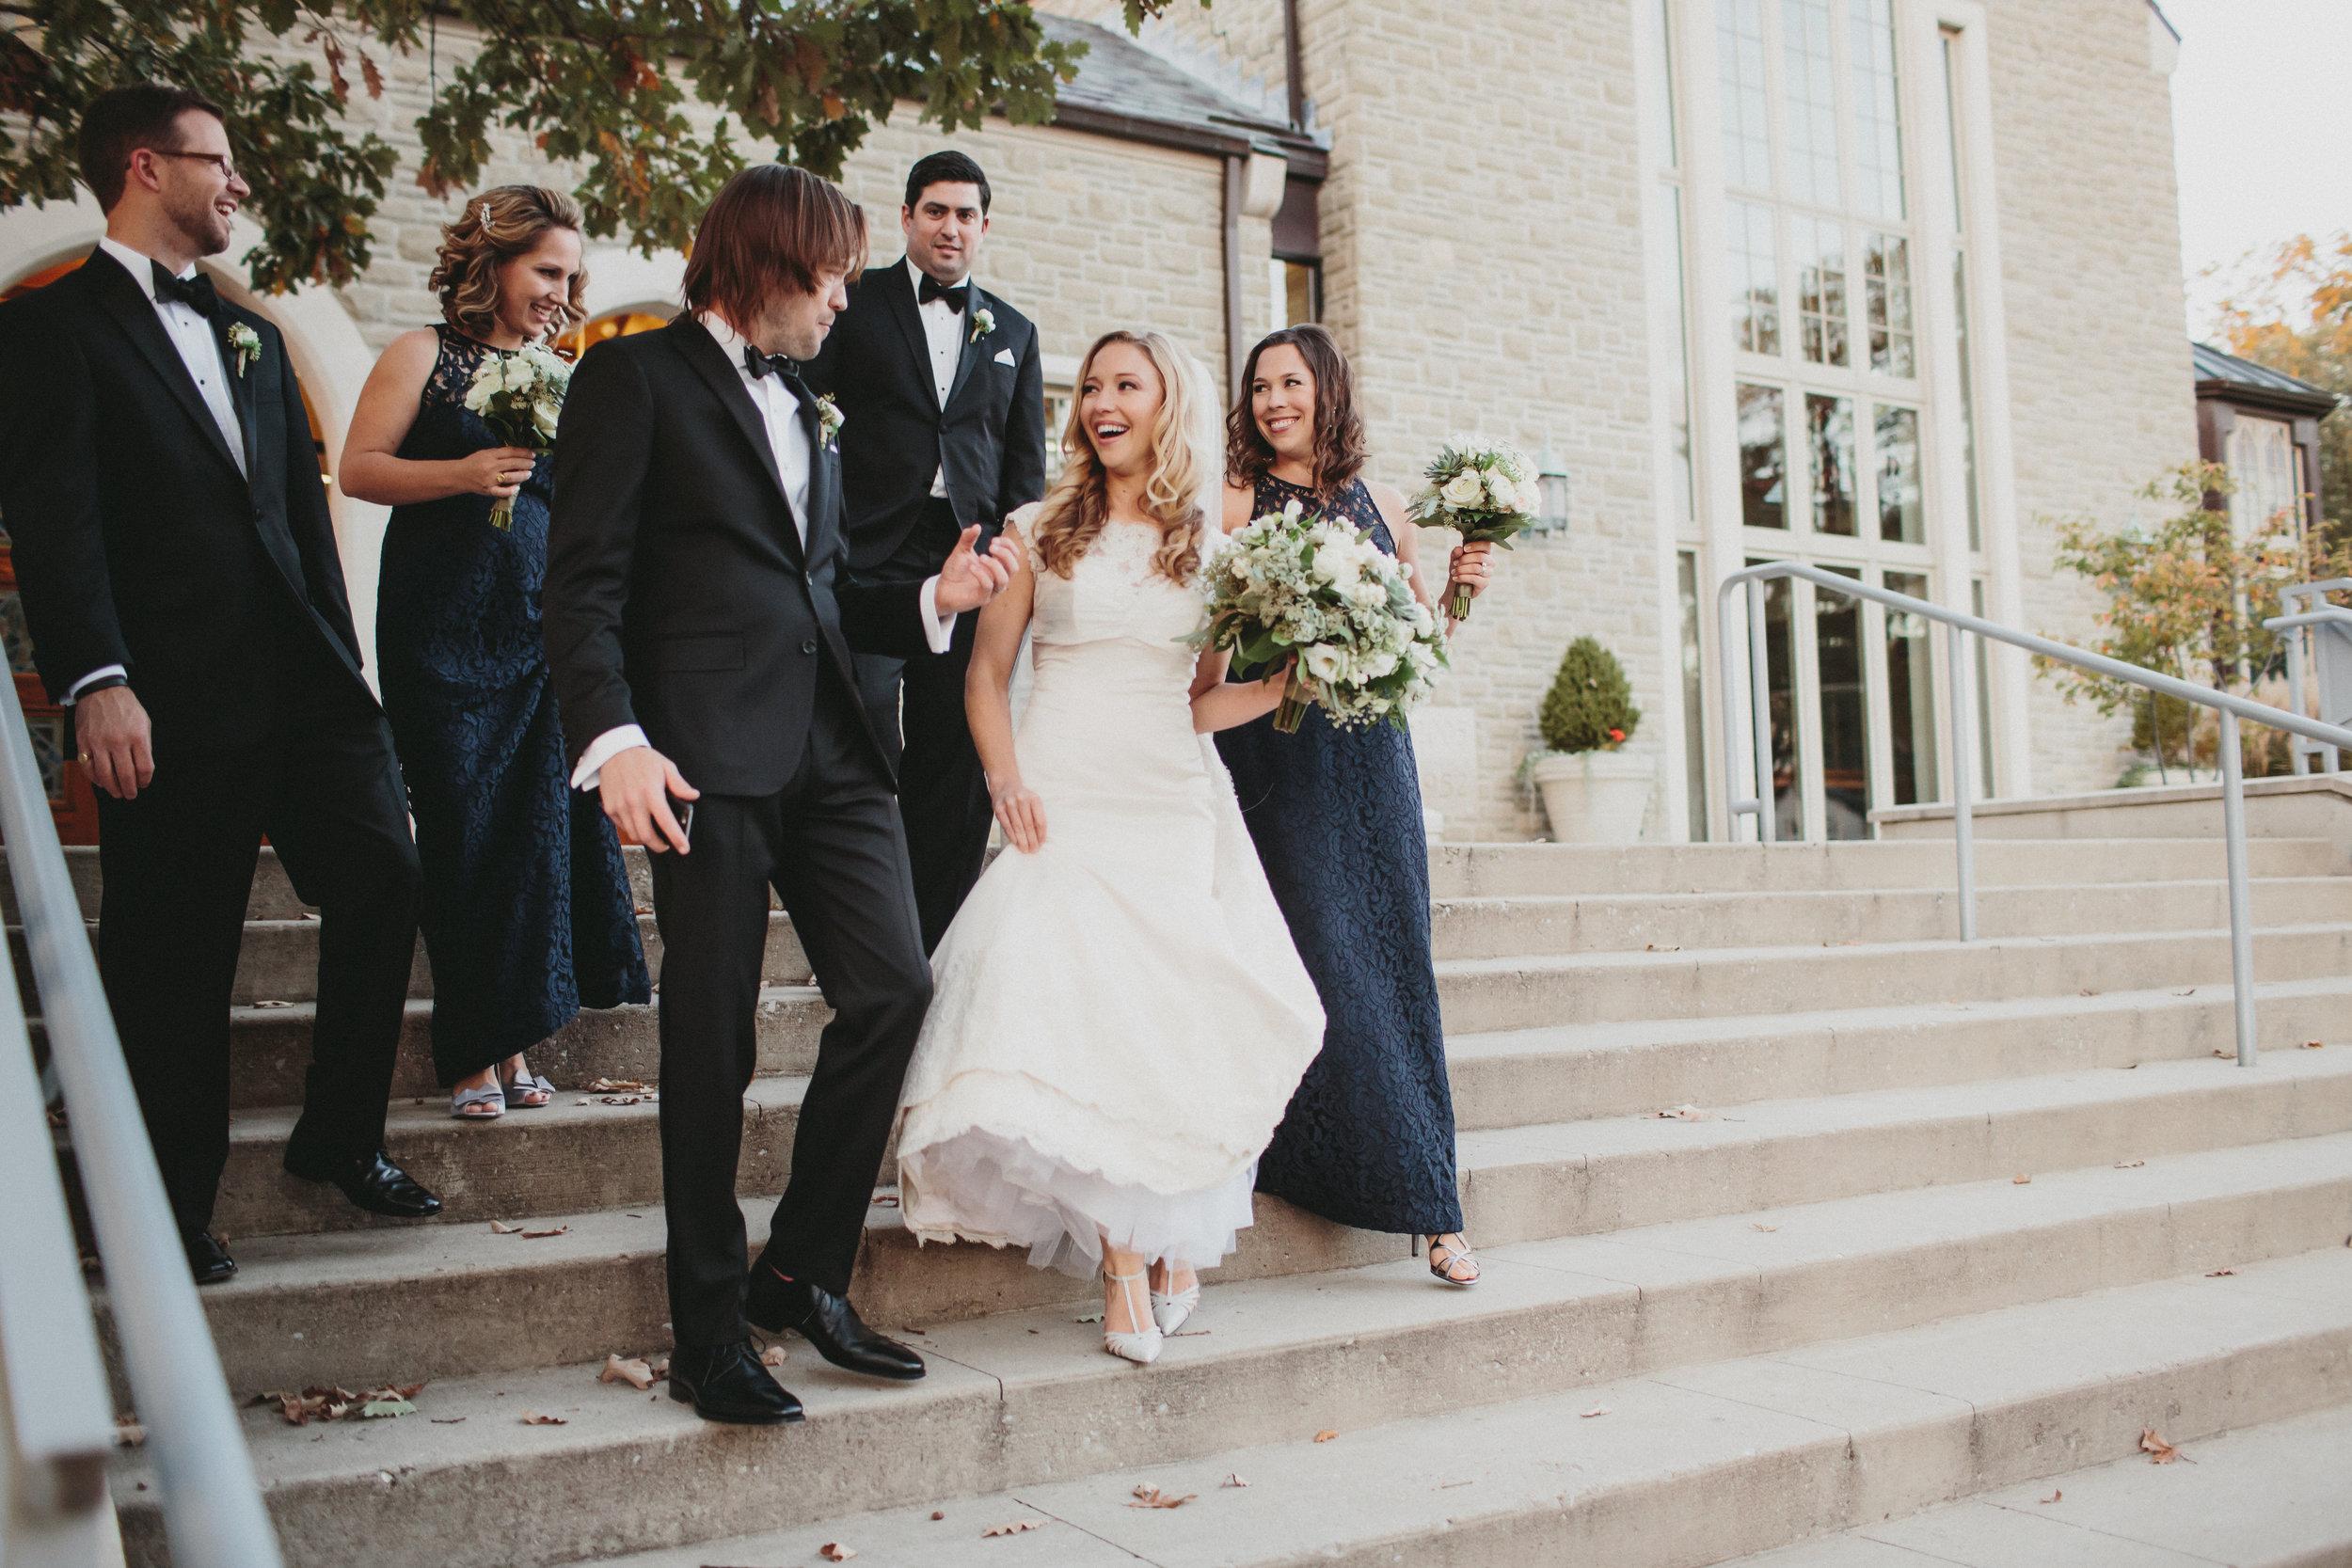 the_carrs_photography_katie_matt_wedding_0653.jpg